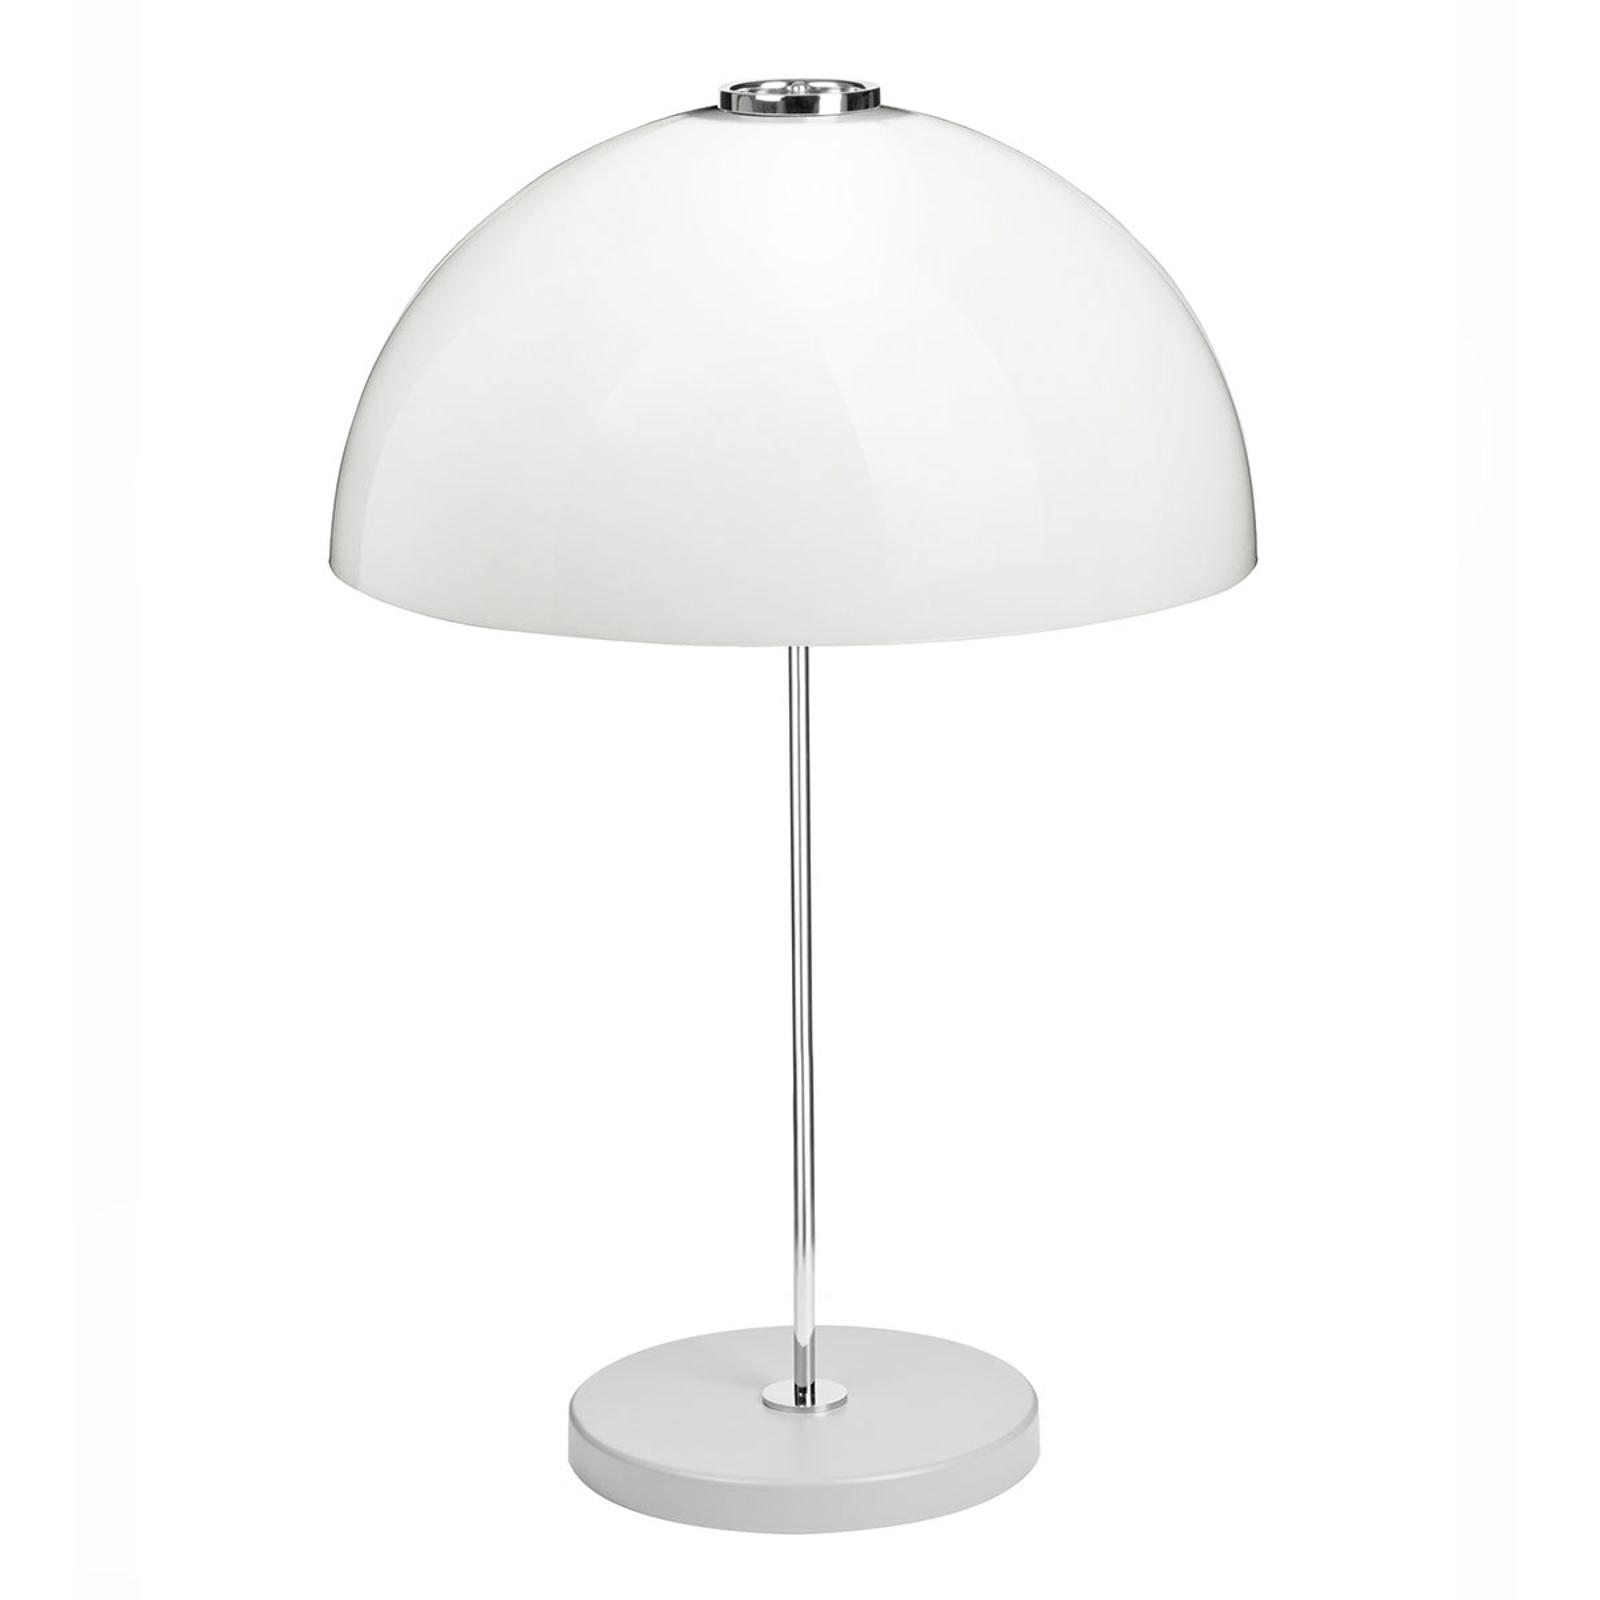 Innolux Kupoli lampada da tavolo base grigia